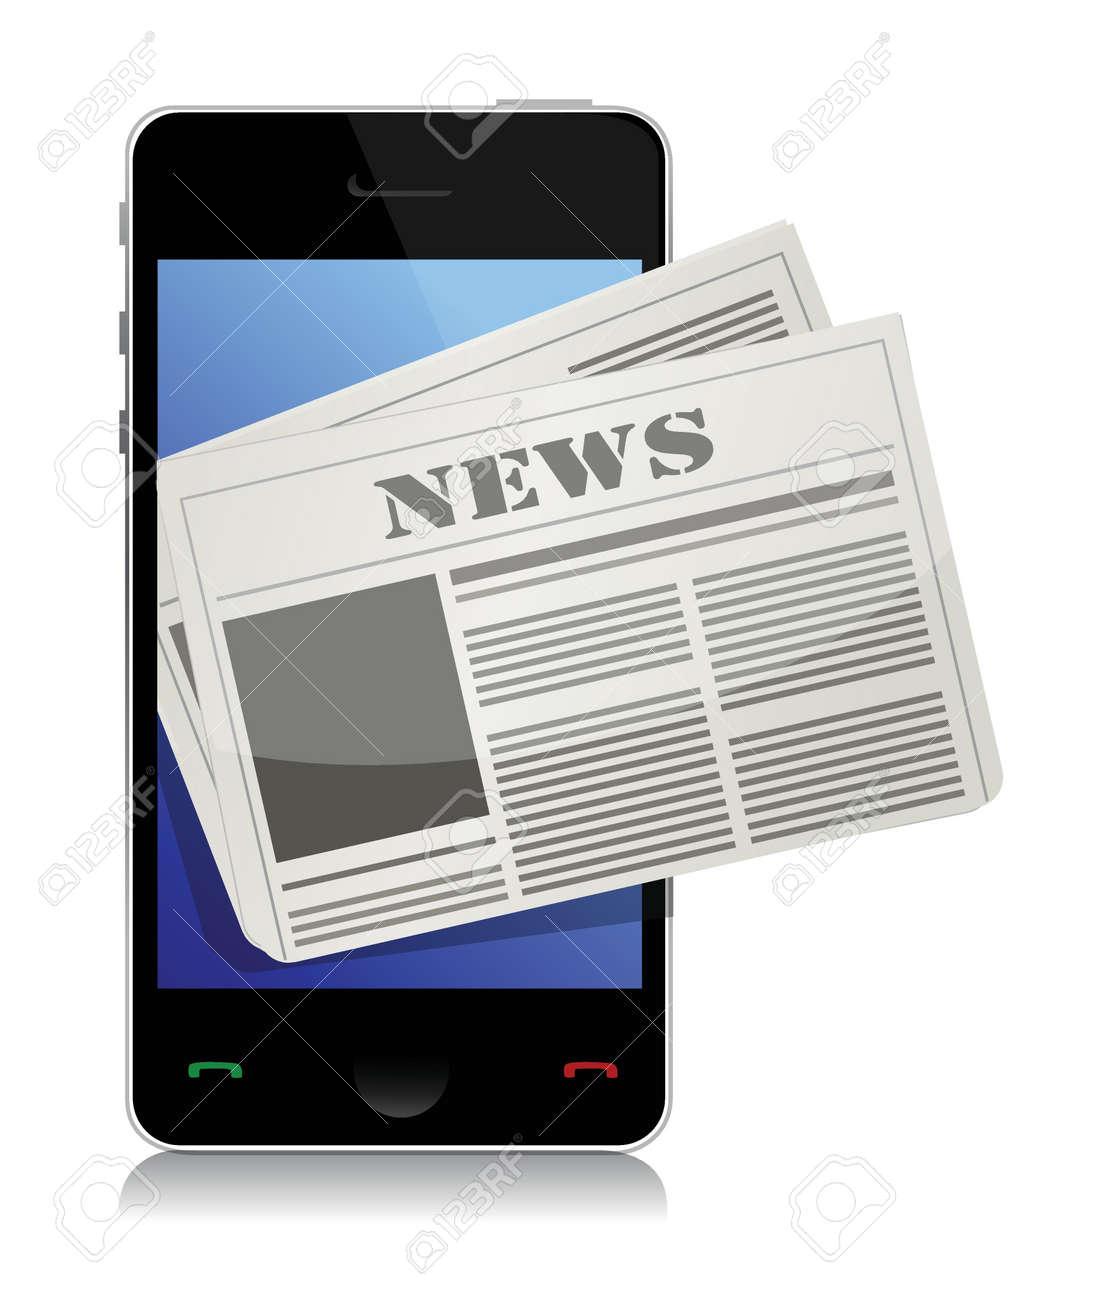 Mobile news concept illustration design over a white background Stock Vector - 17058027